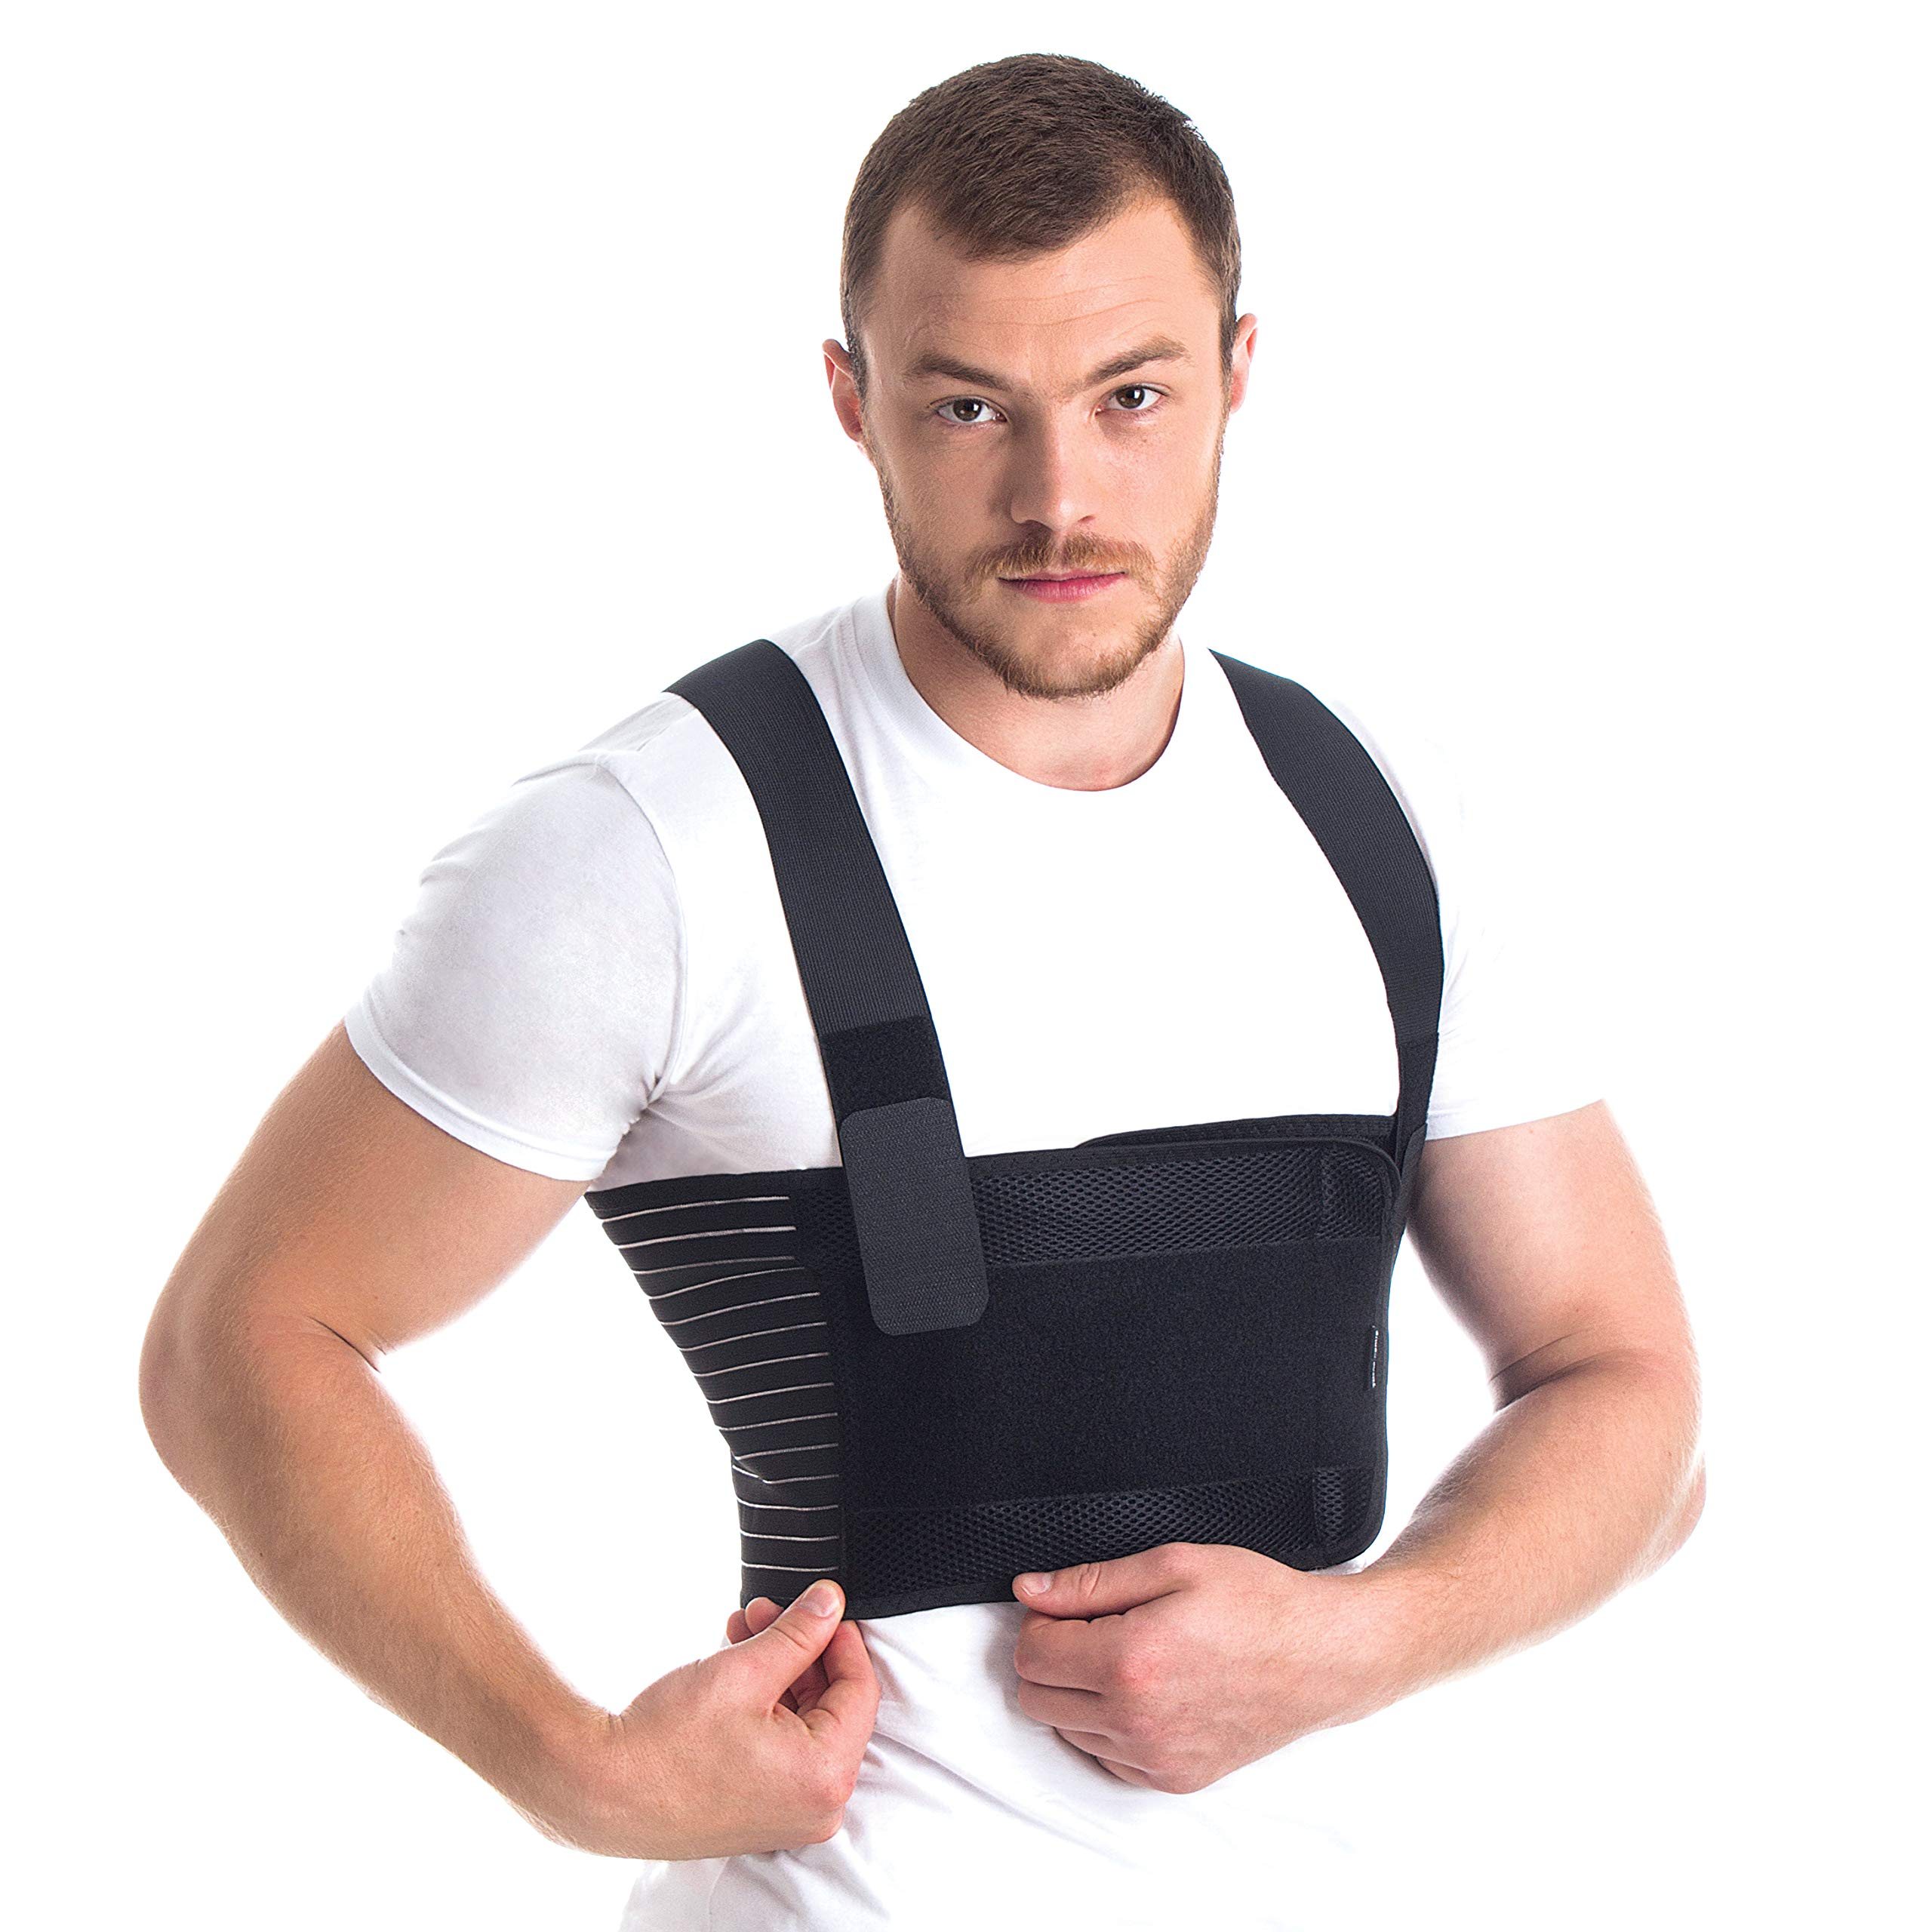 Orthopedic Male Rib Belt/Men's Chest Support - Elastic Breathable Brace Black Small